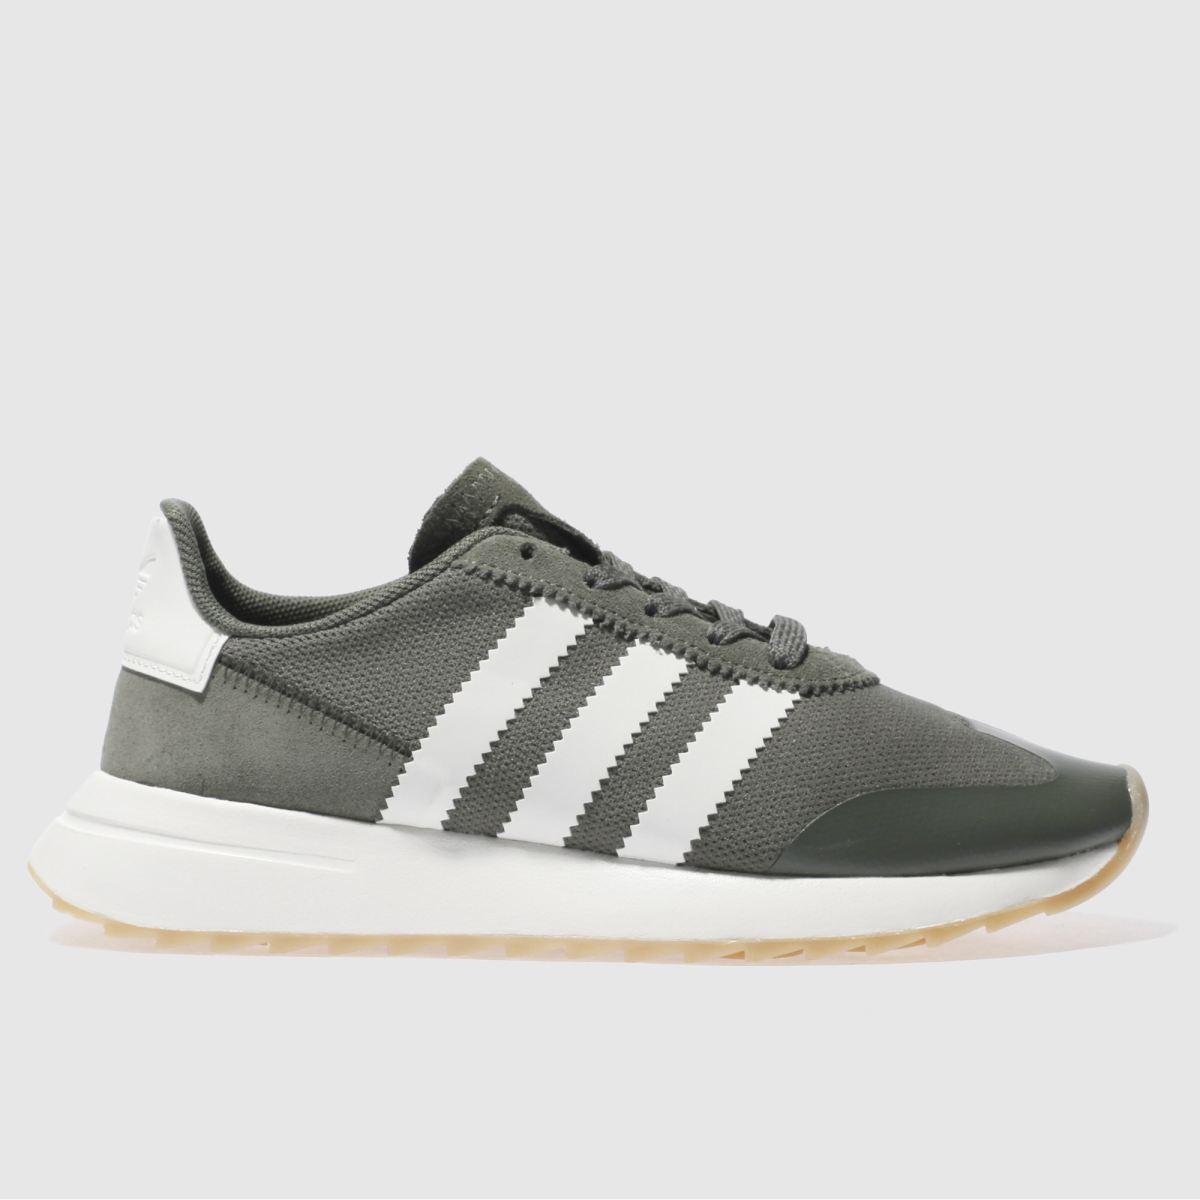 adidas khaki flb trainers